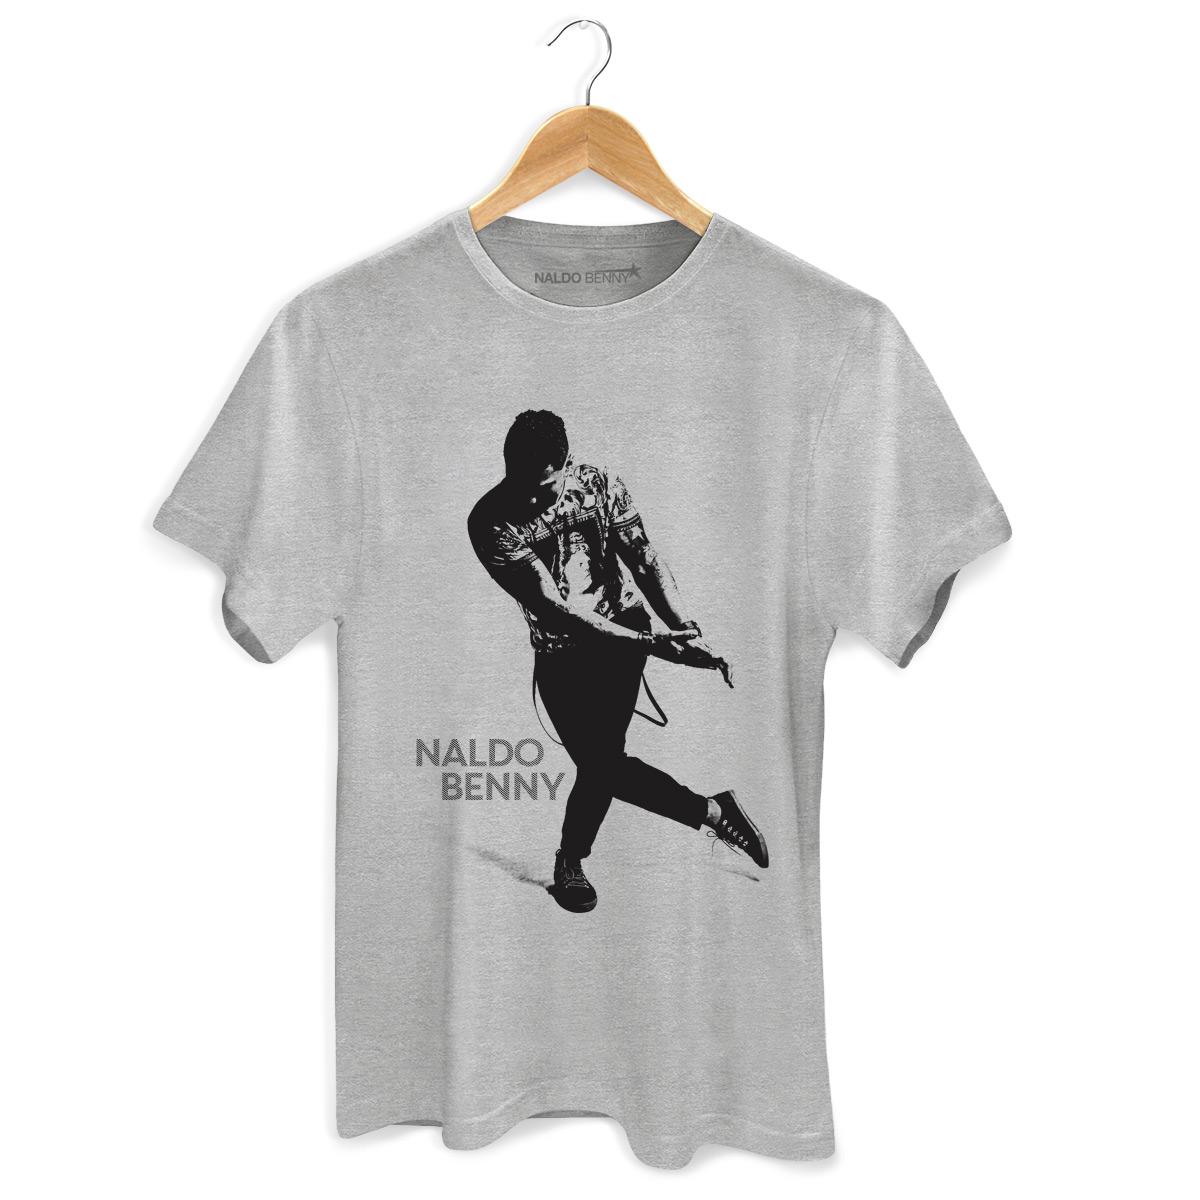 Camiseta Masculina Naldo Benny Se Joga